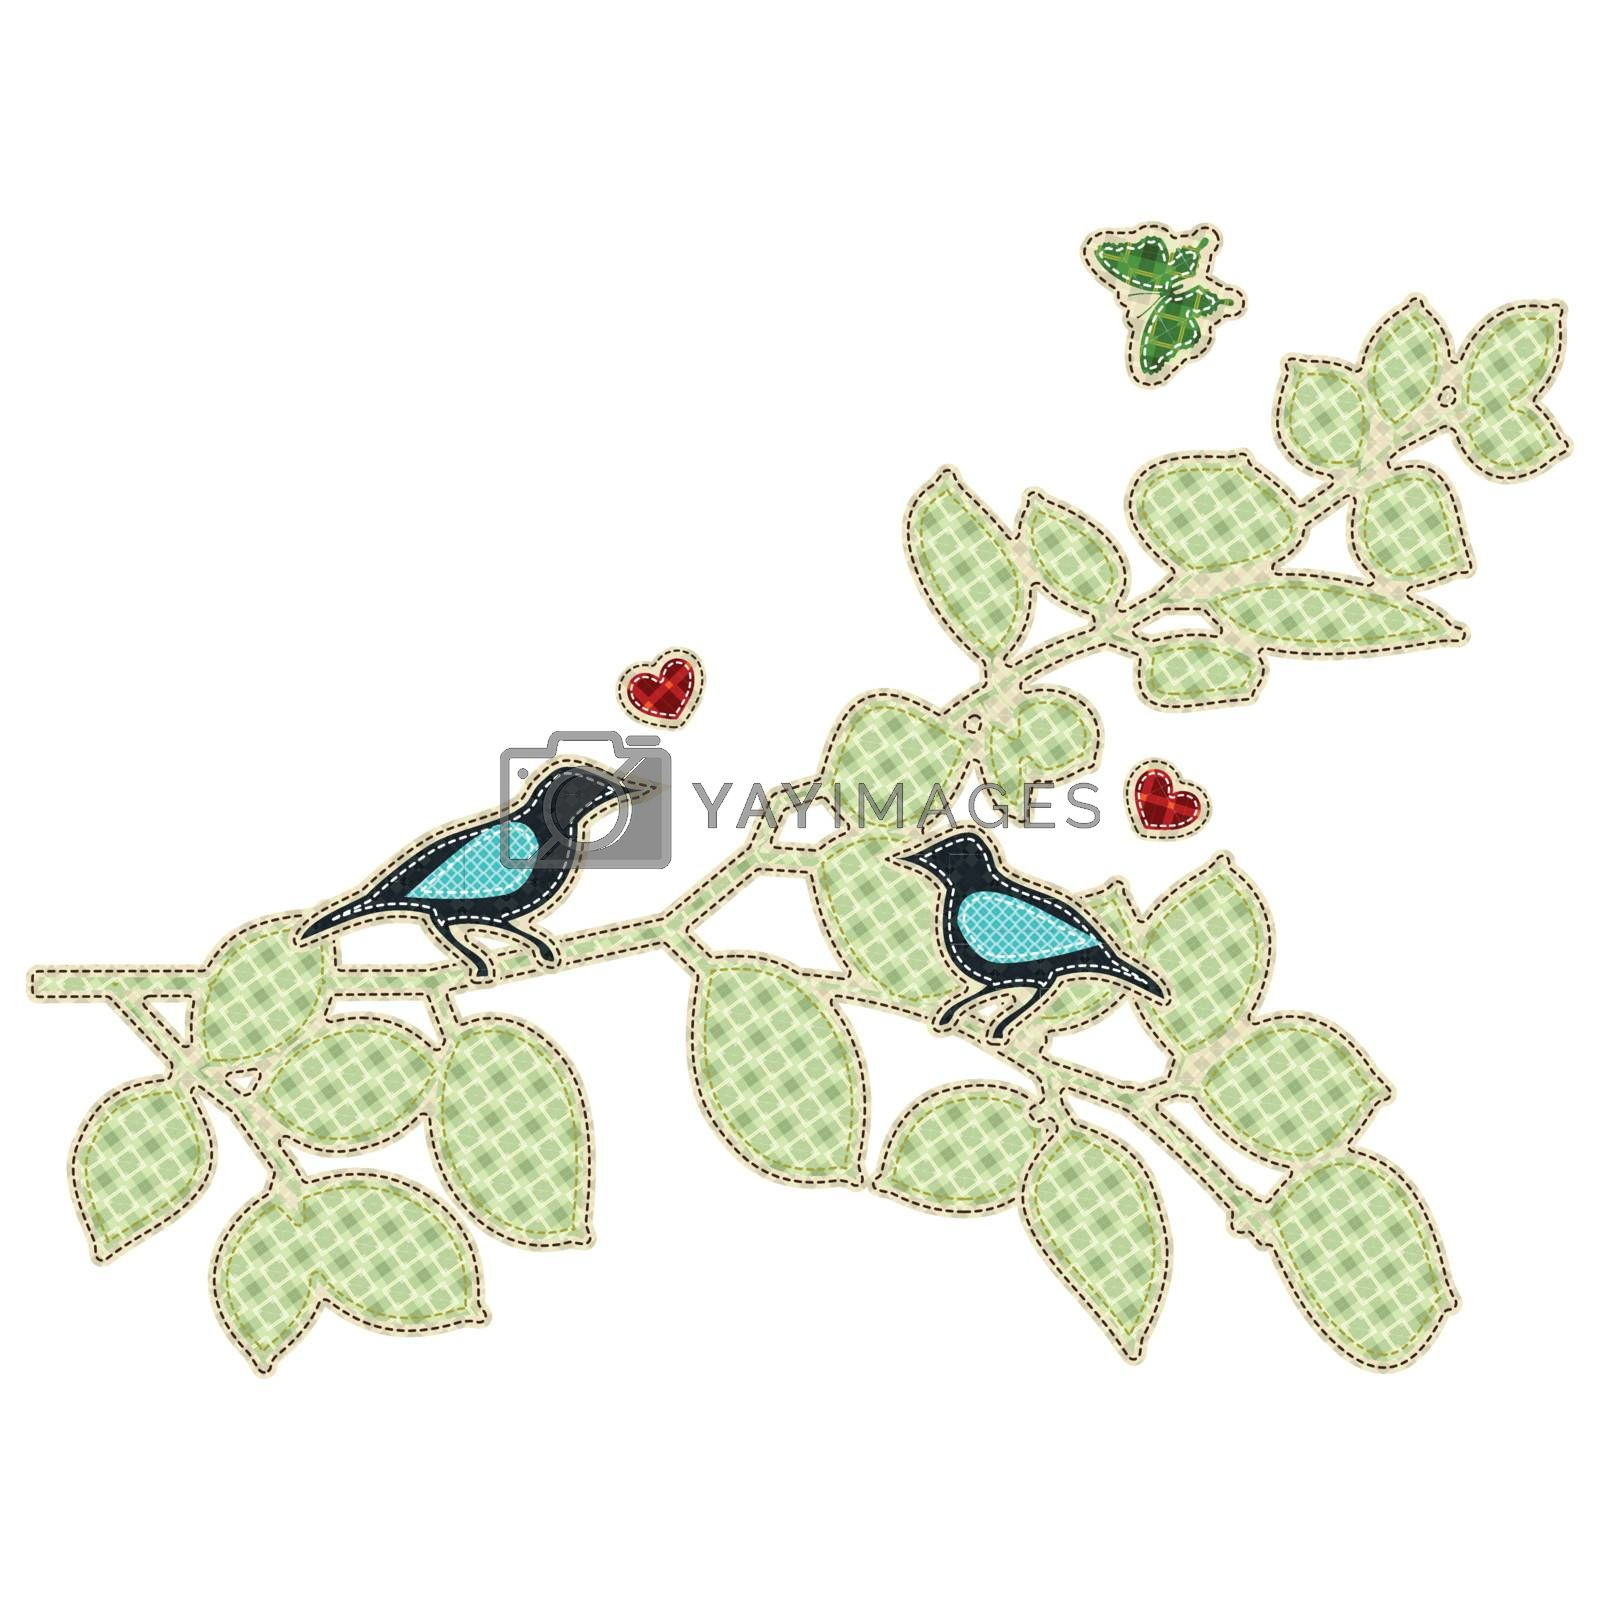 Illustrations patchwork of love bird